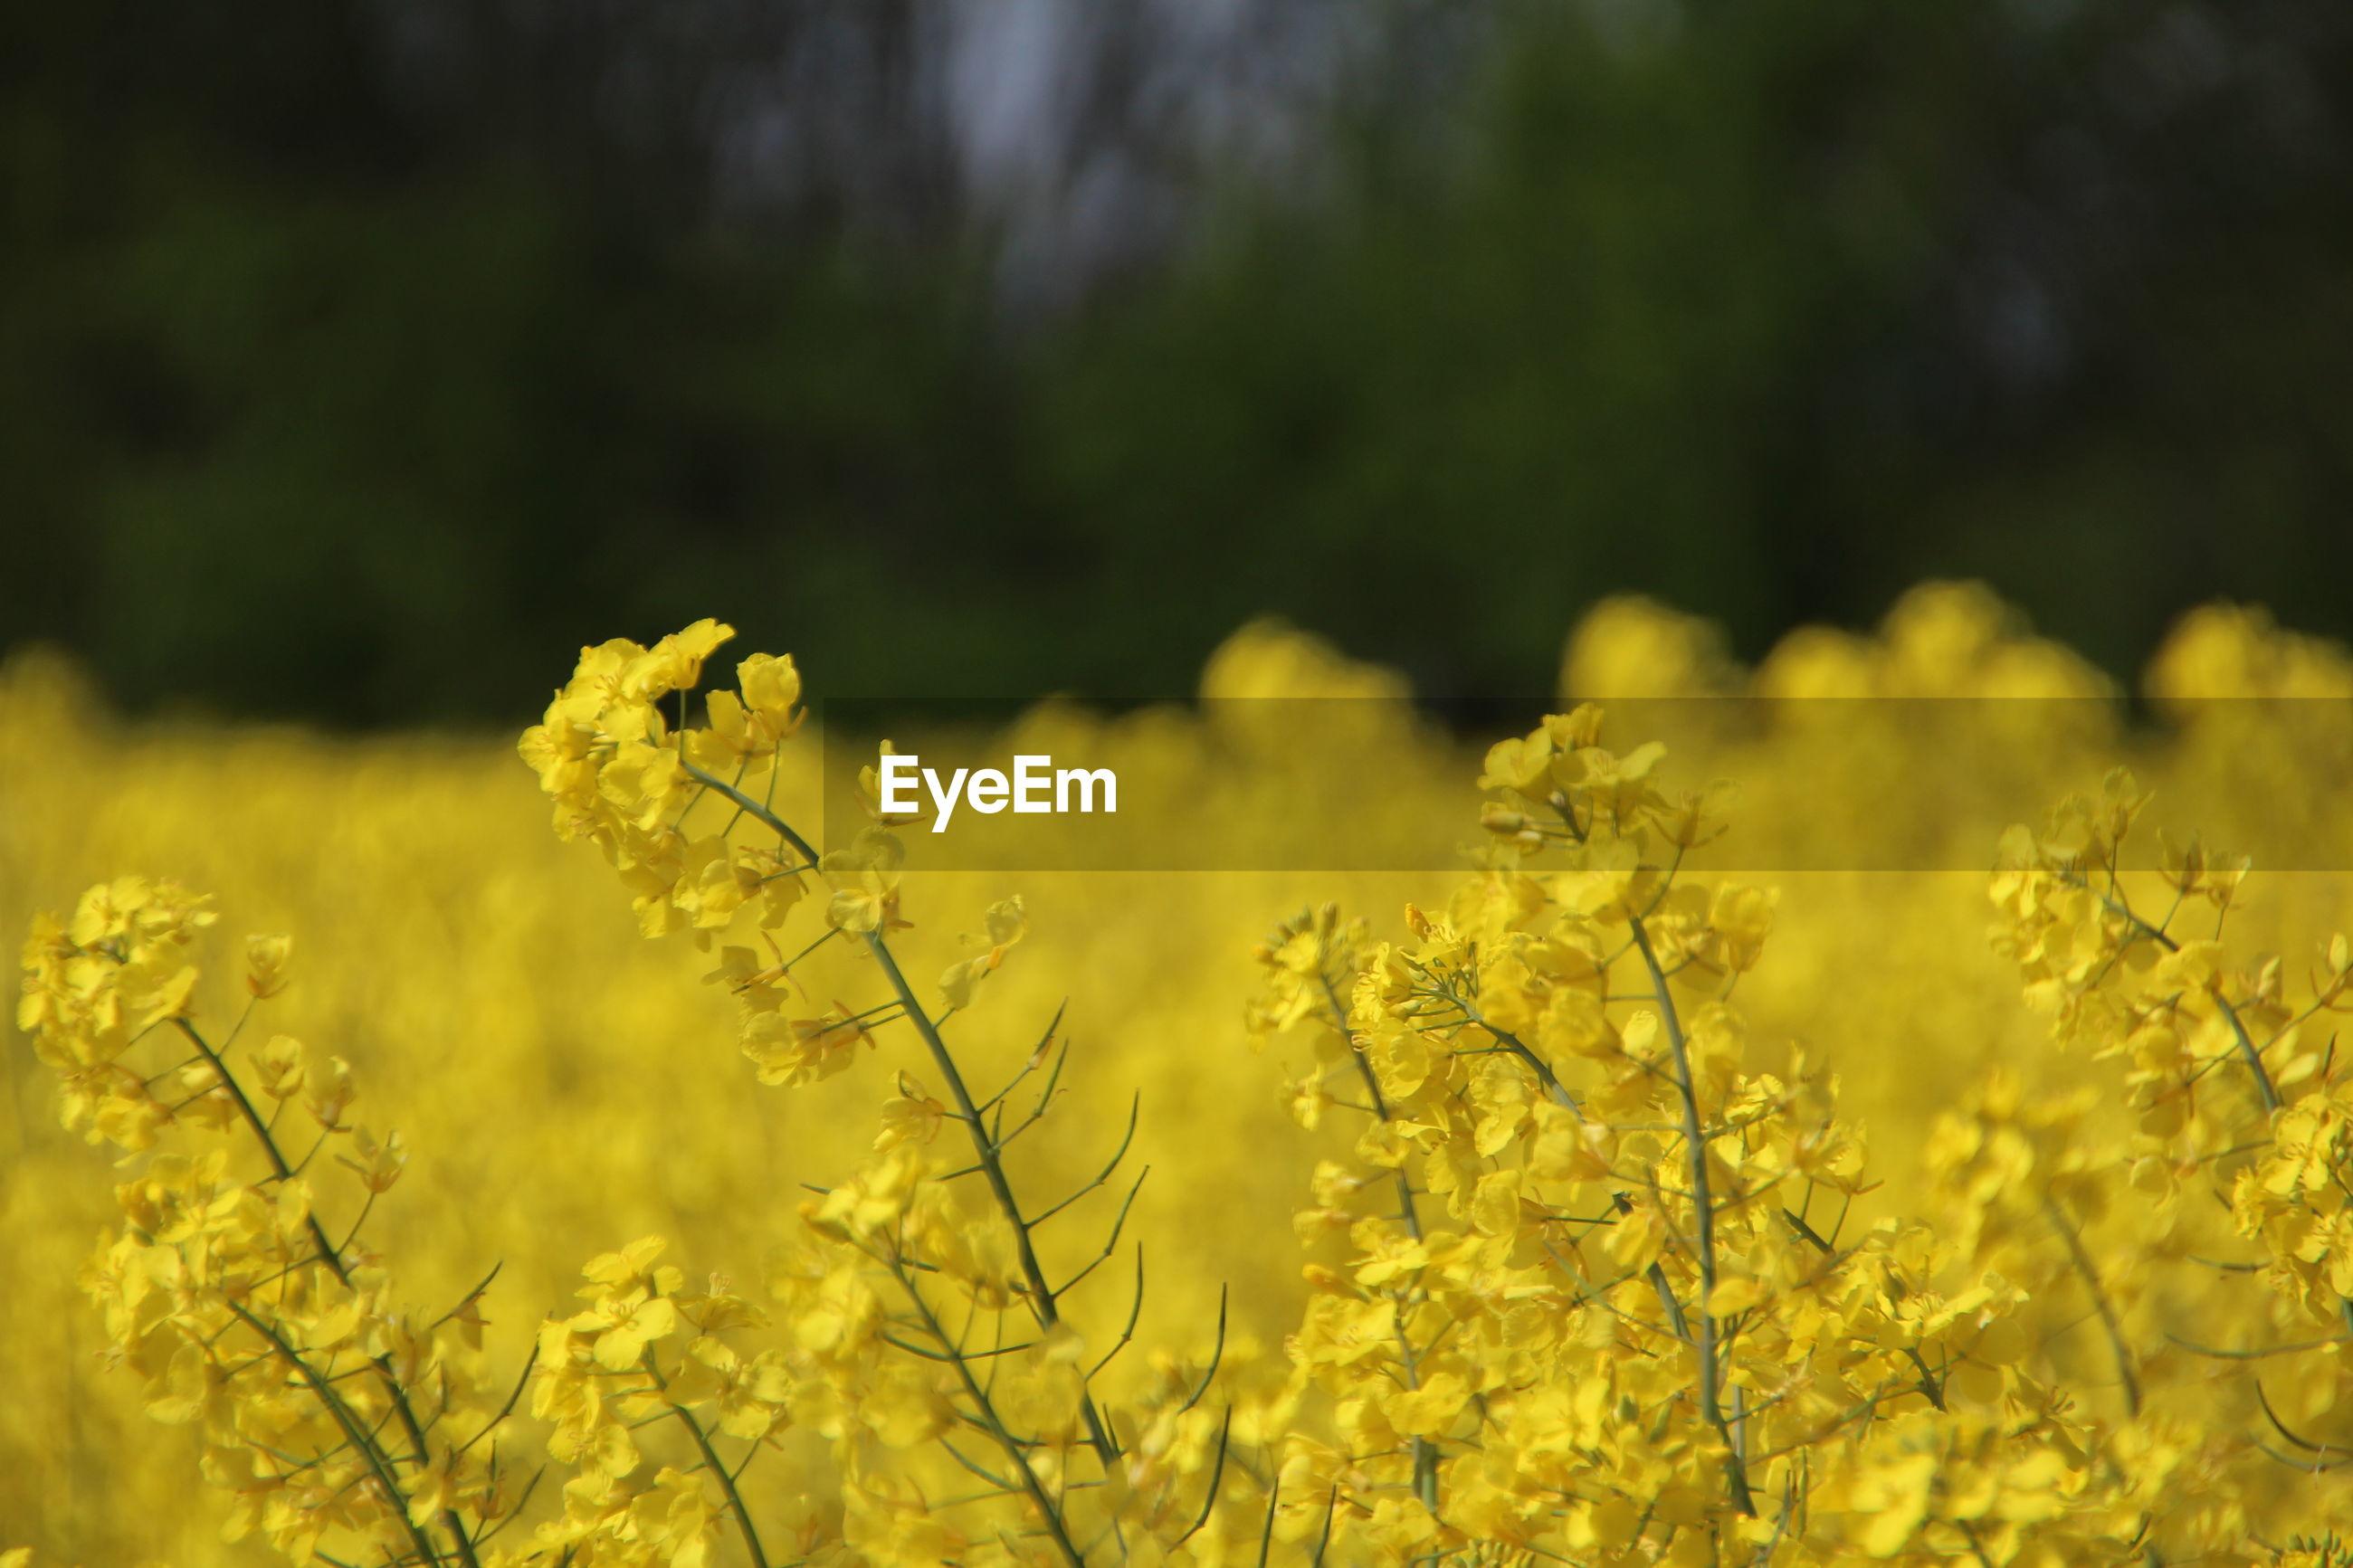 SCENIC VIEW OF YELLOW FLOWERING PLANTS